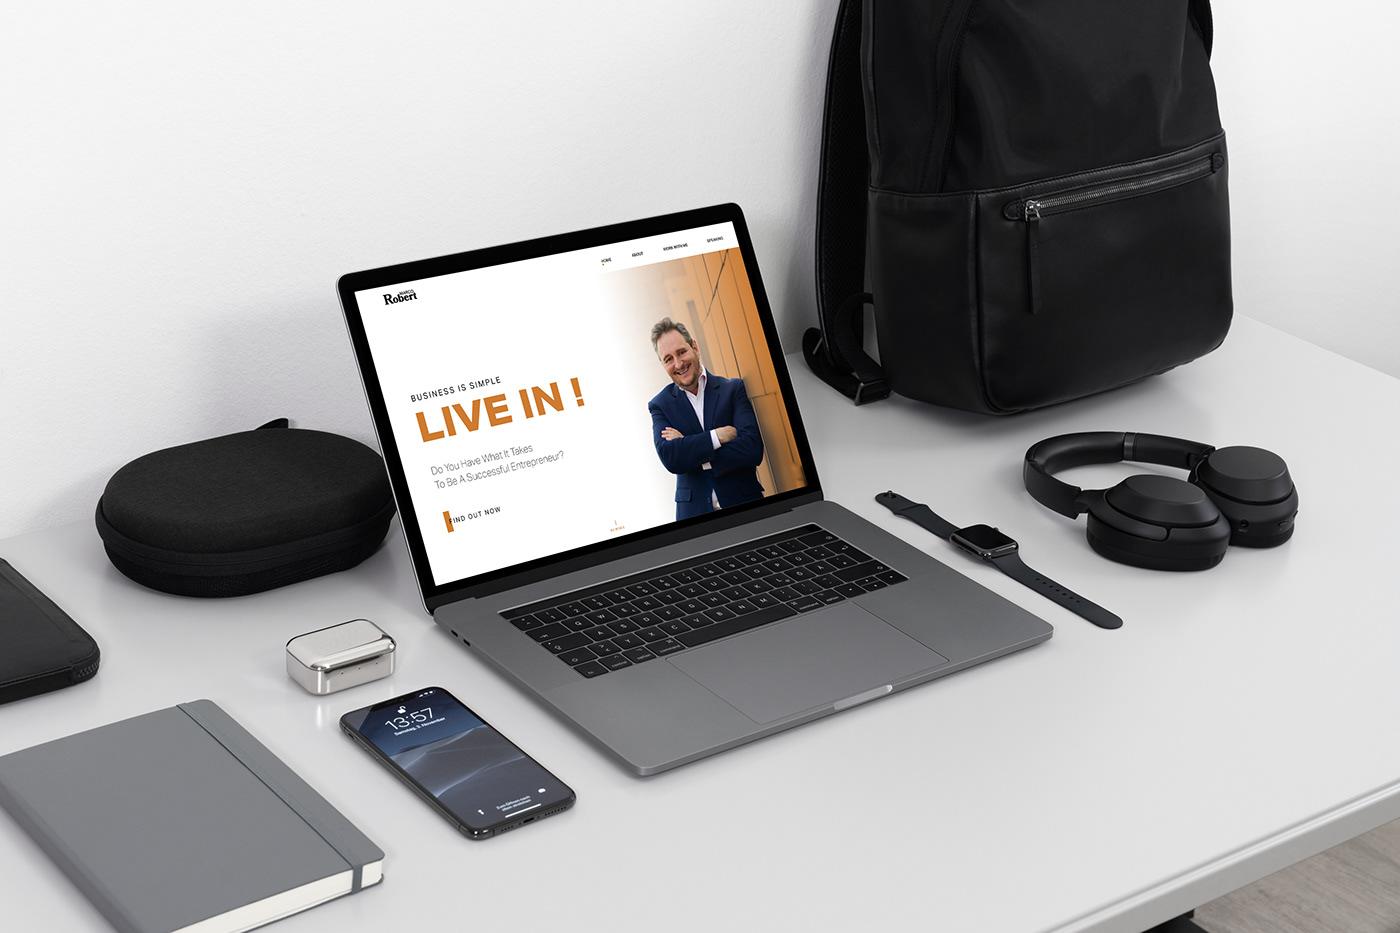 adventure brand Coach consultant entrepreneur life luxury modern sophistication success